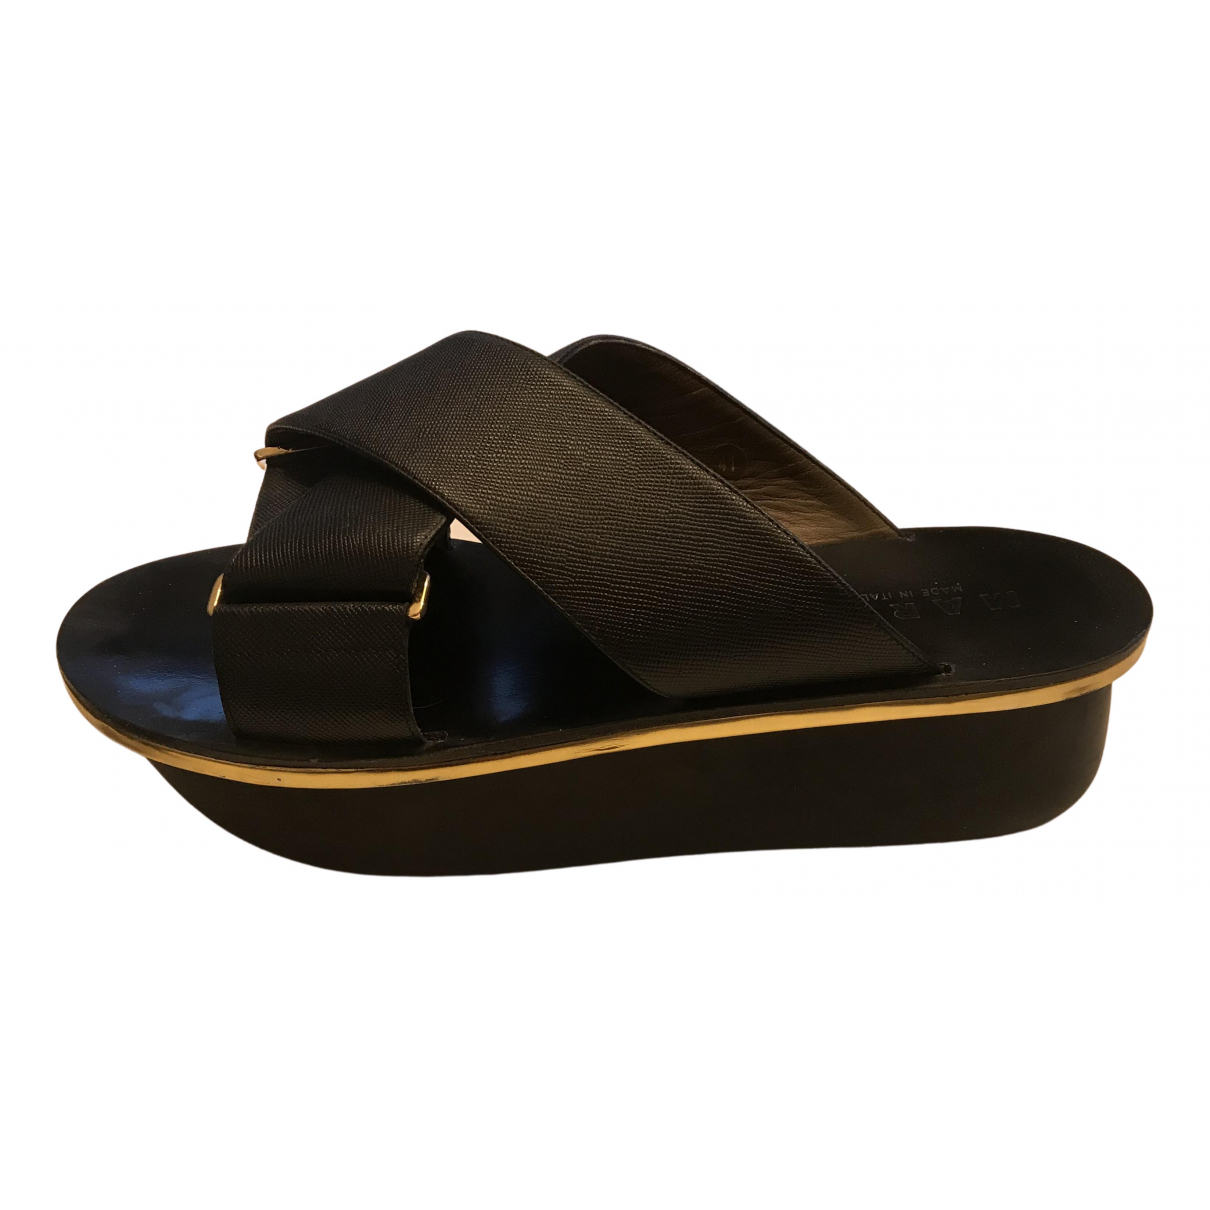 Marni N Black Leather Sandals for Women 41 EU